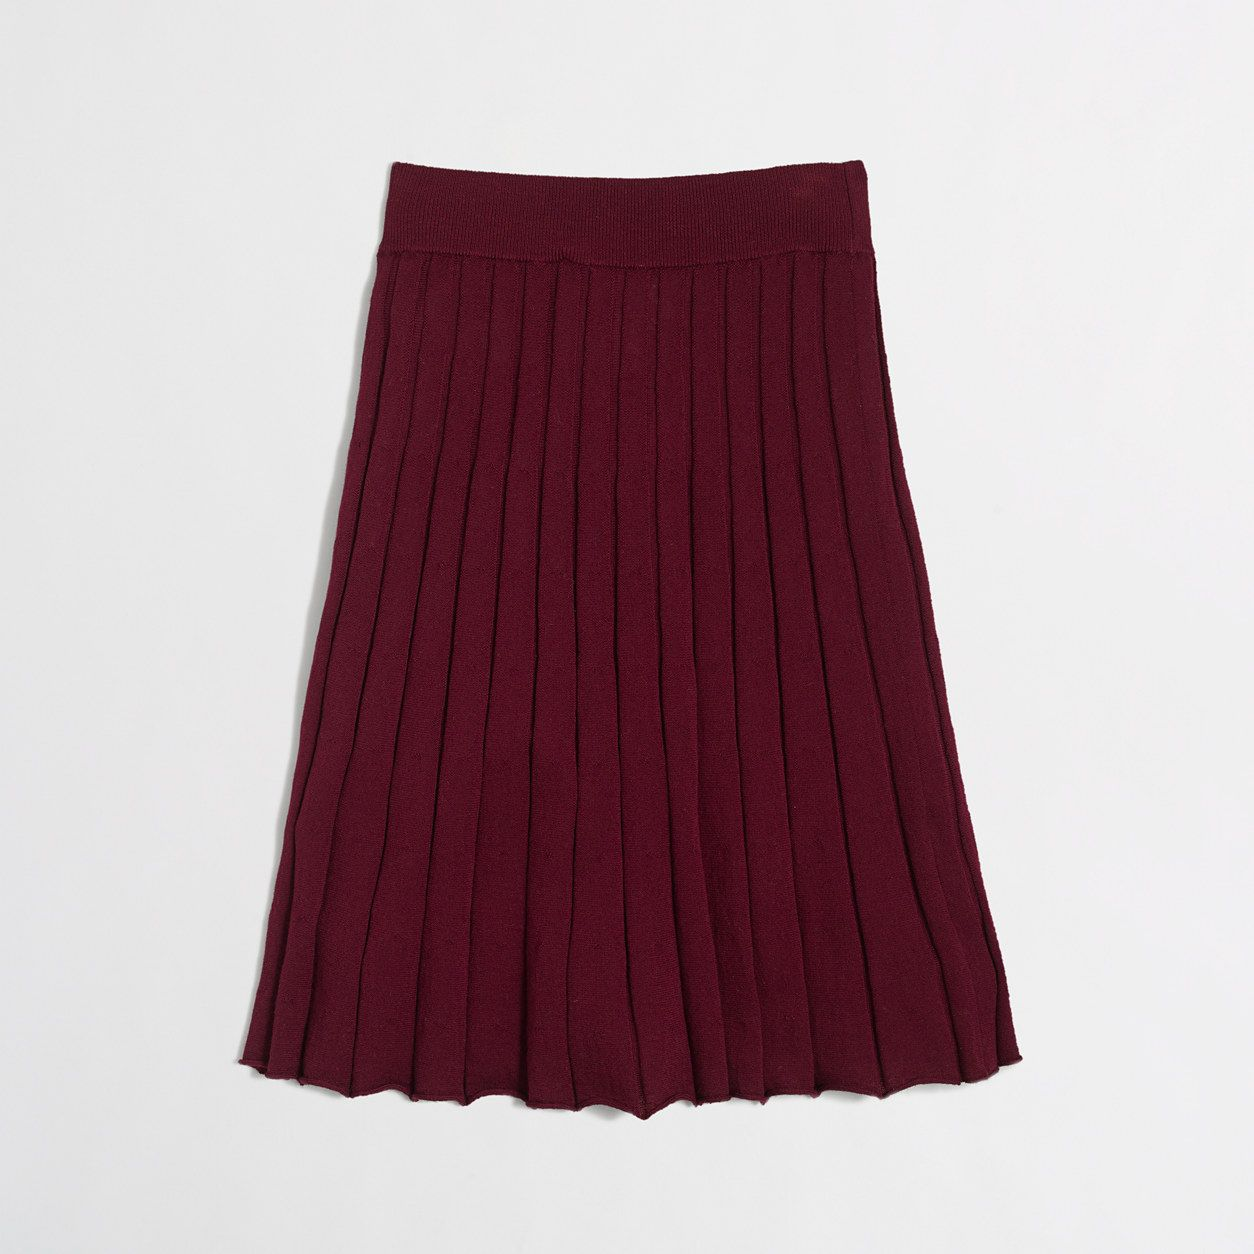 f94dac2573 Pleated merino skirt | s k i r t s | Pleated Skirt, Skirts, Winter ...